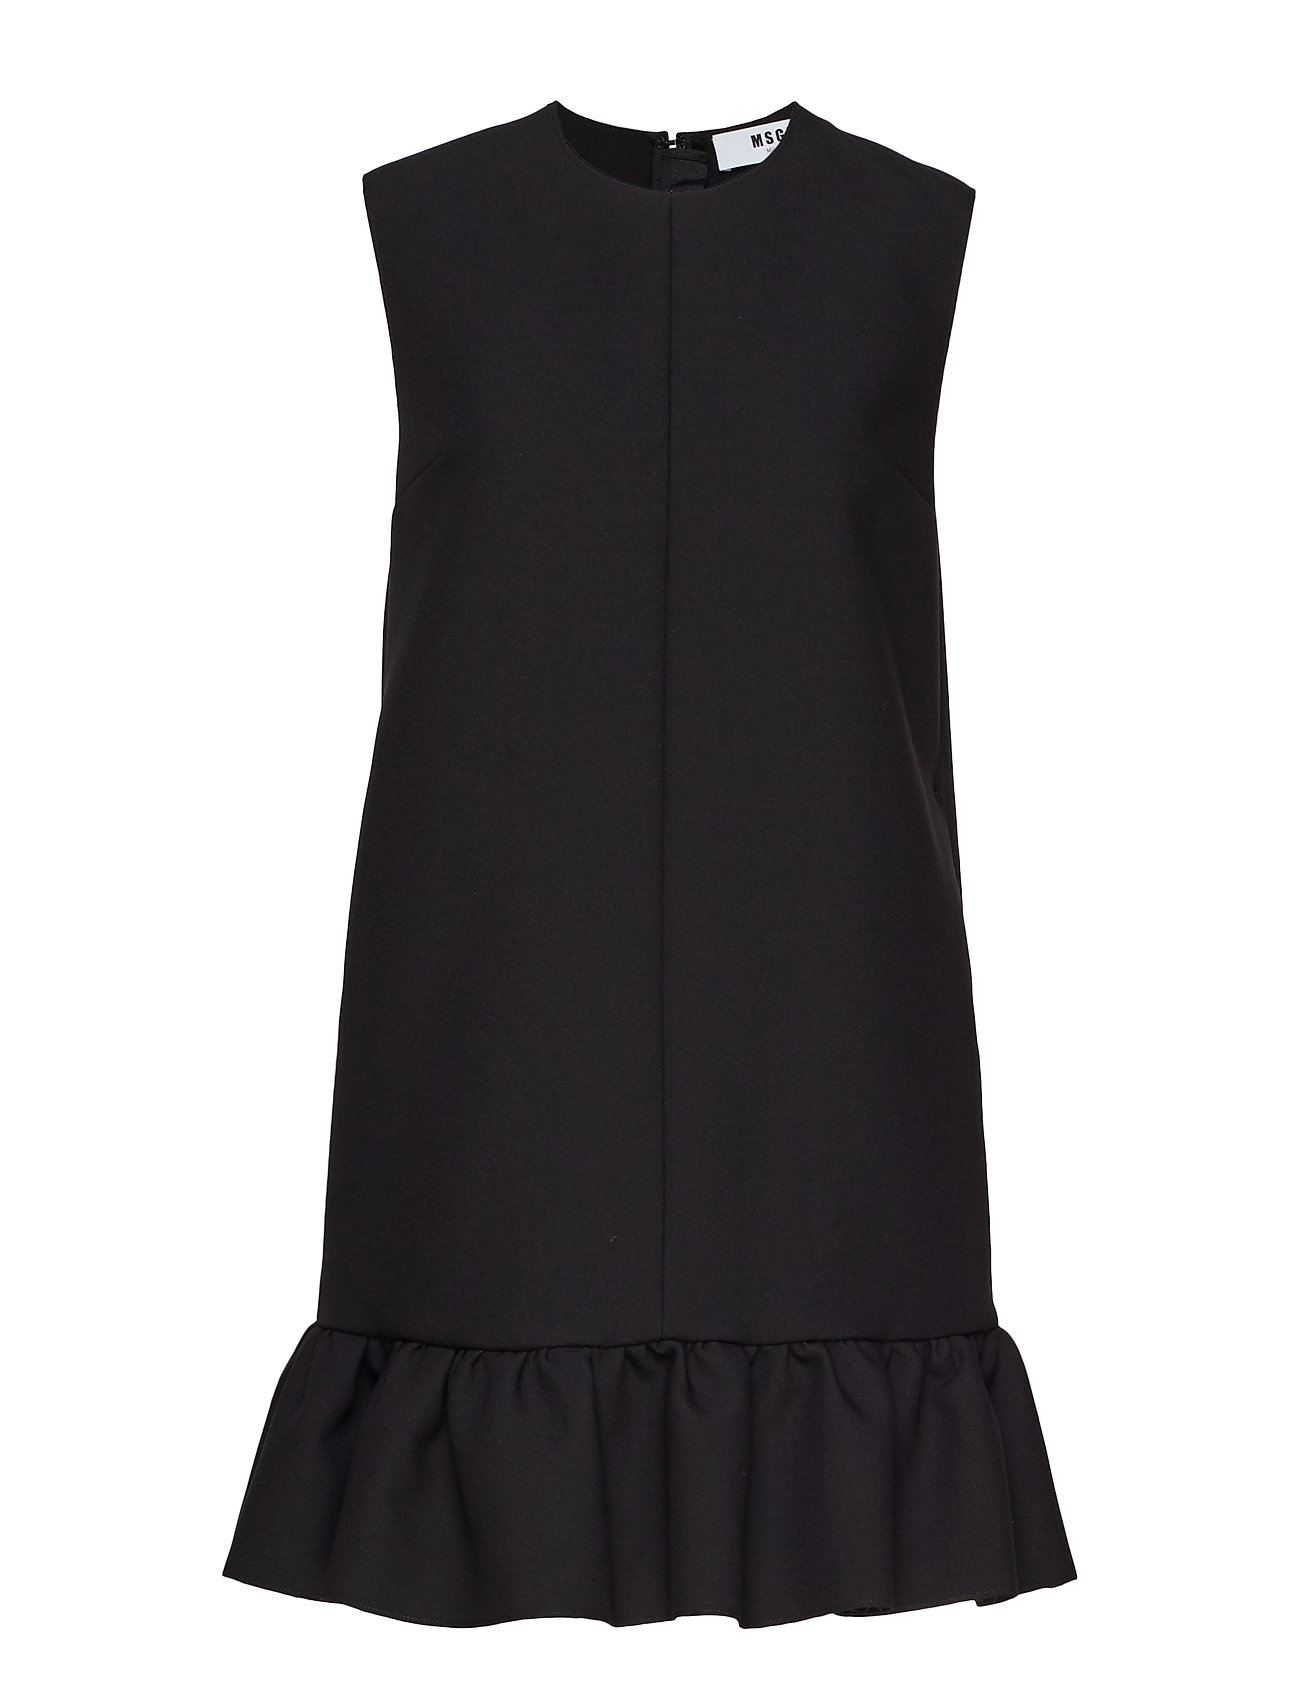 MSGM HEAVY DOUBLE CREPE CADY DRESS - BLACK